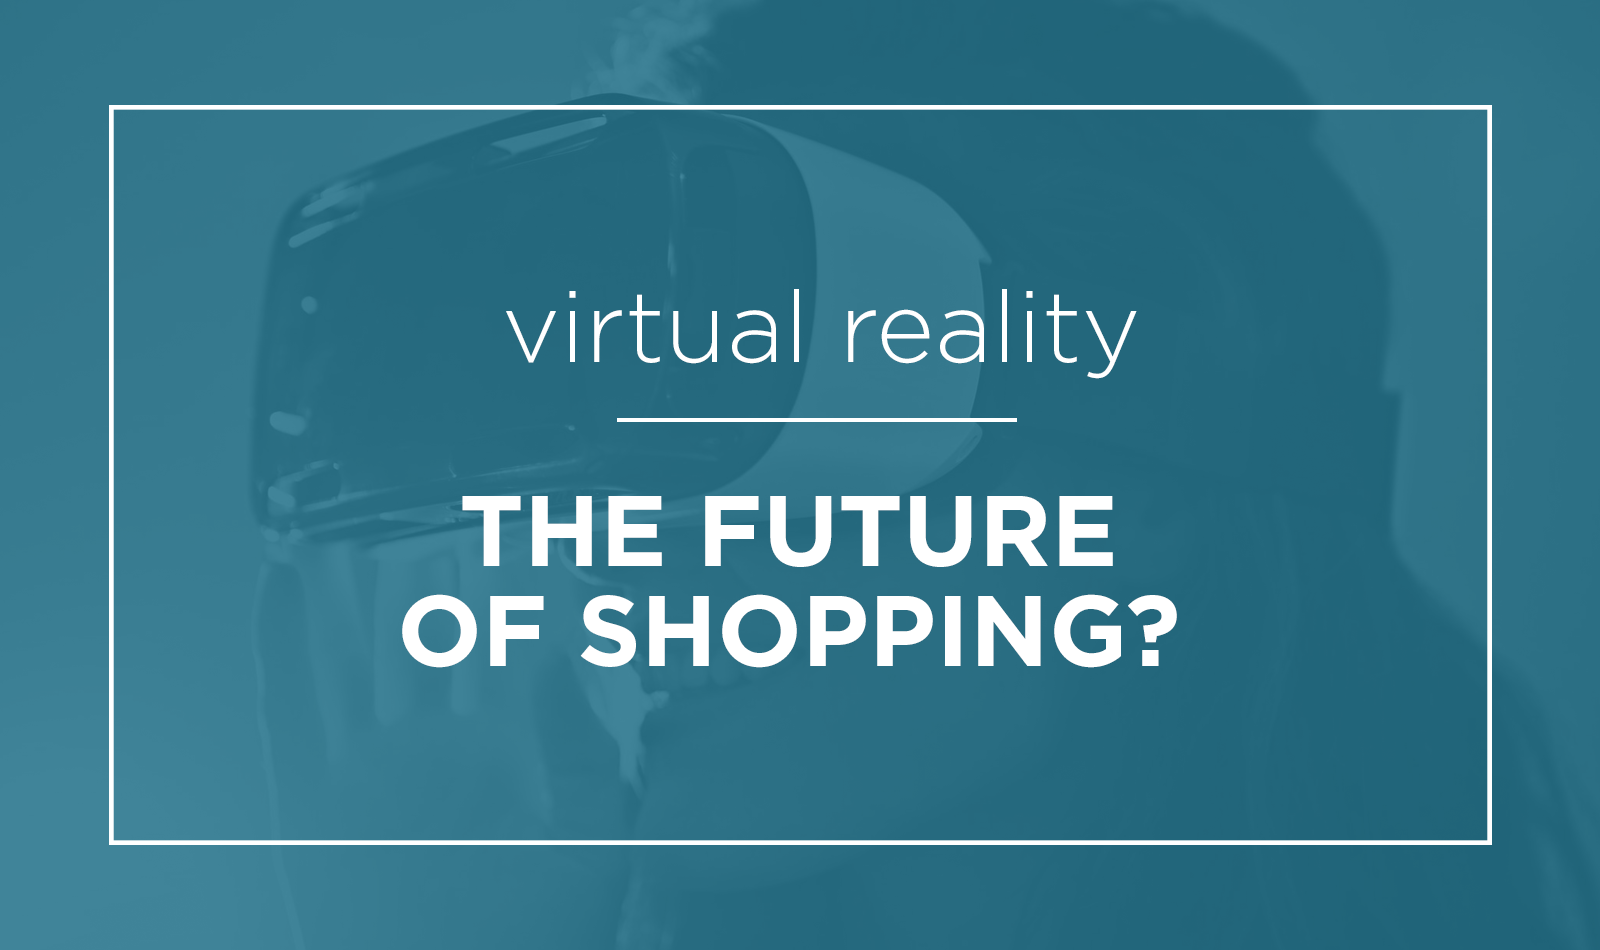 virtual-reality-future-of-shopping